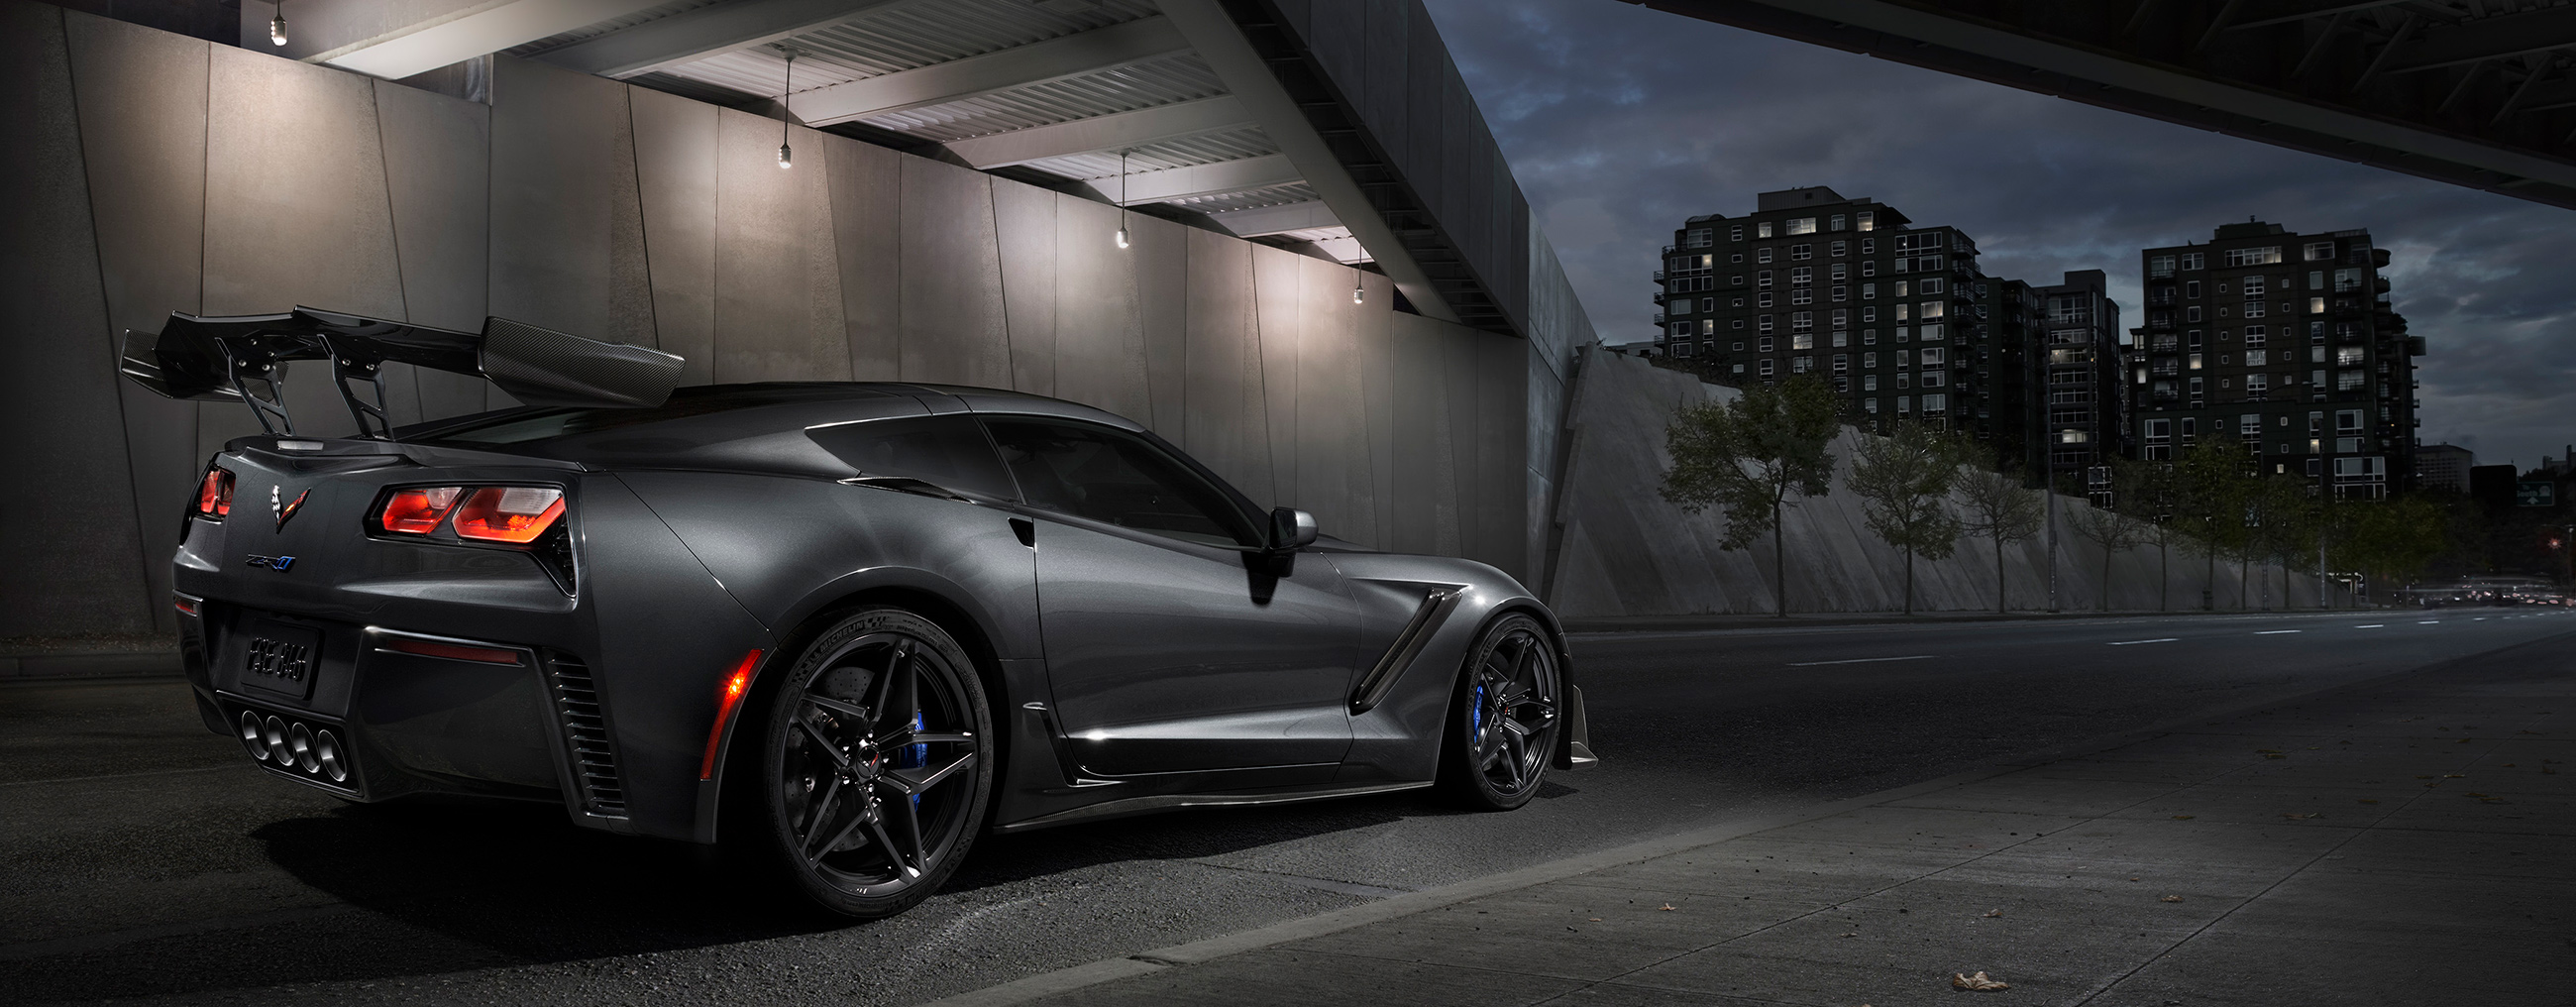 TrackWorthy - 2019 Chevrolet Corvette ZR1 (2)